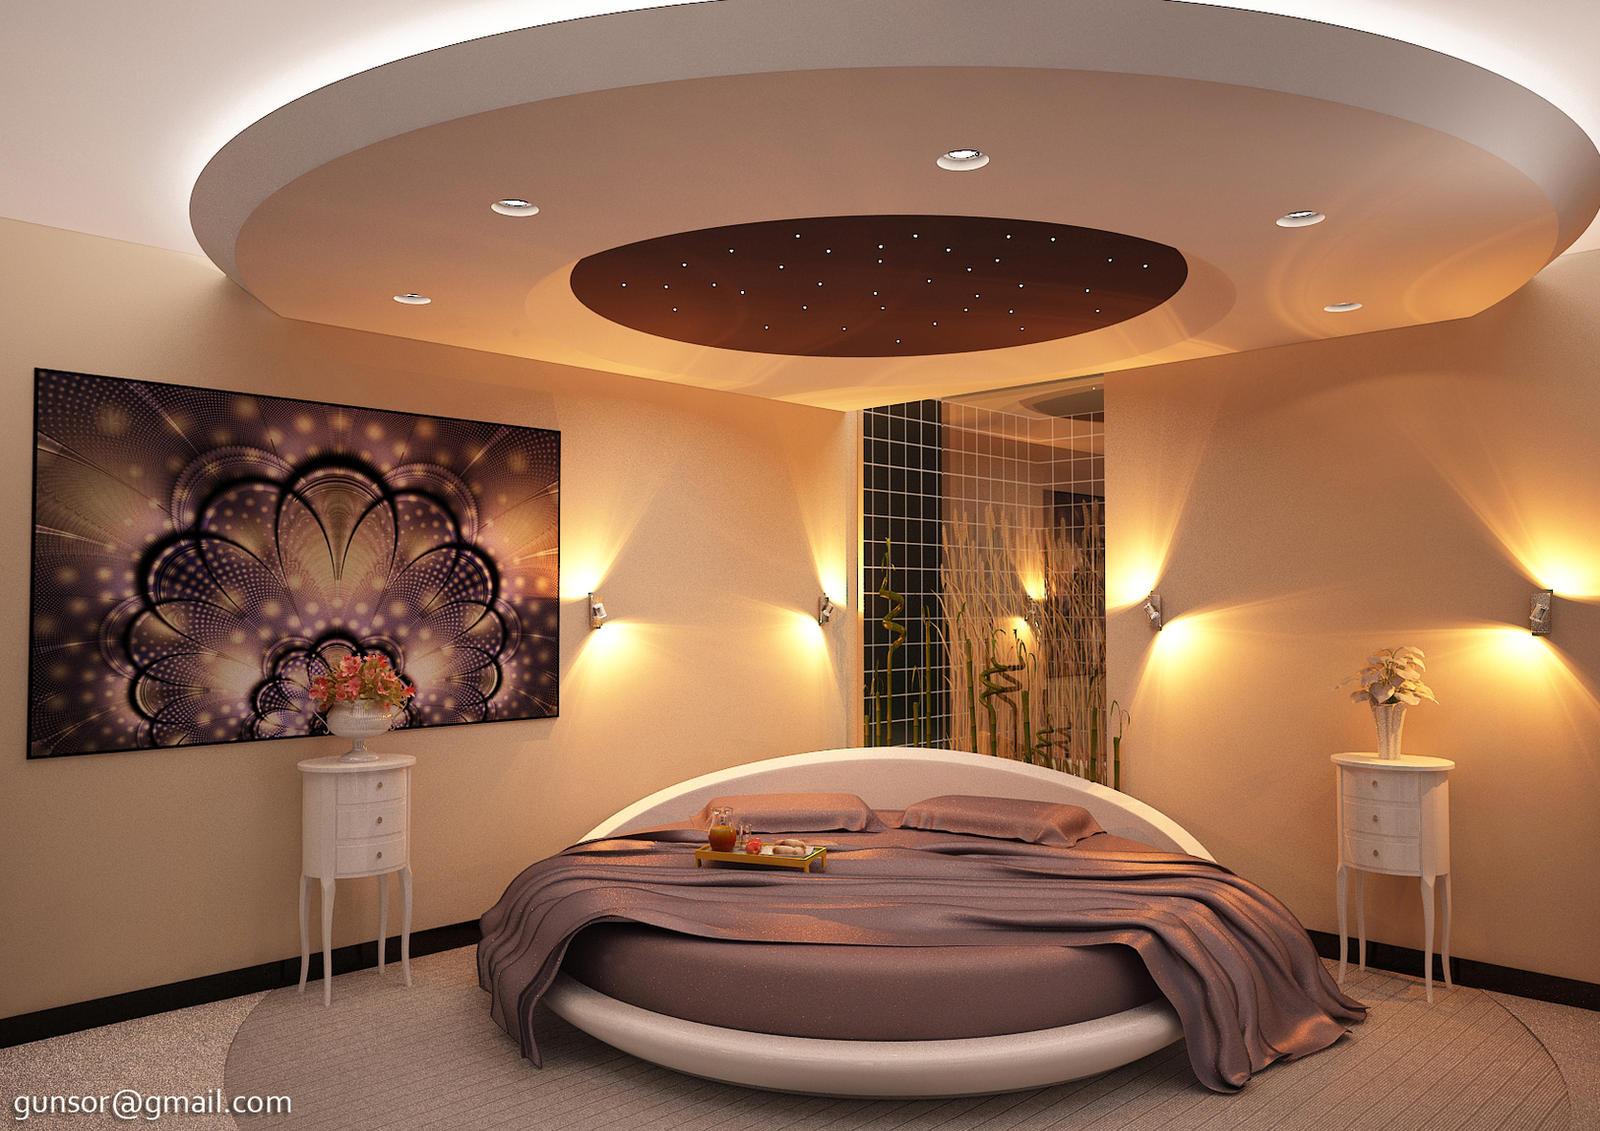 Modern Bedroom 2 by 1zmim on DeviantArt